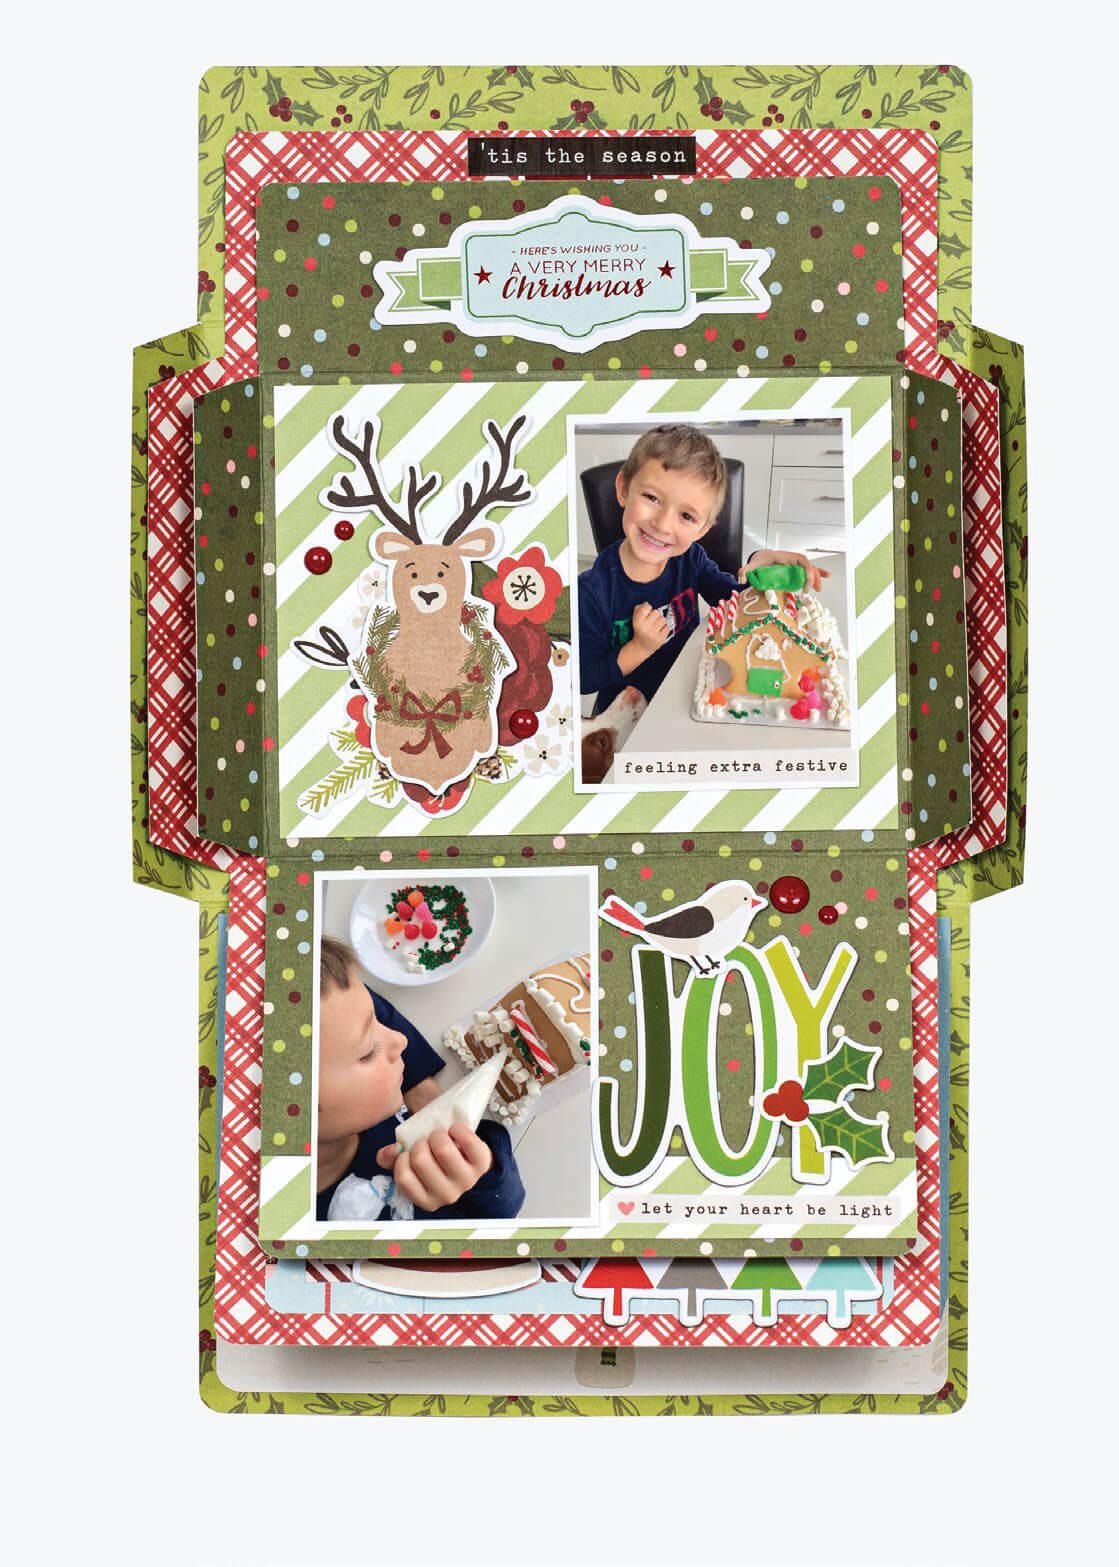 Scrapbook & Cards Today - Winter 2019 - Eat Drink & Be Merry by Virginia Nebel